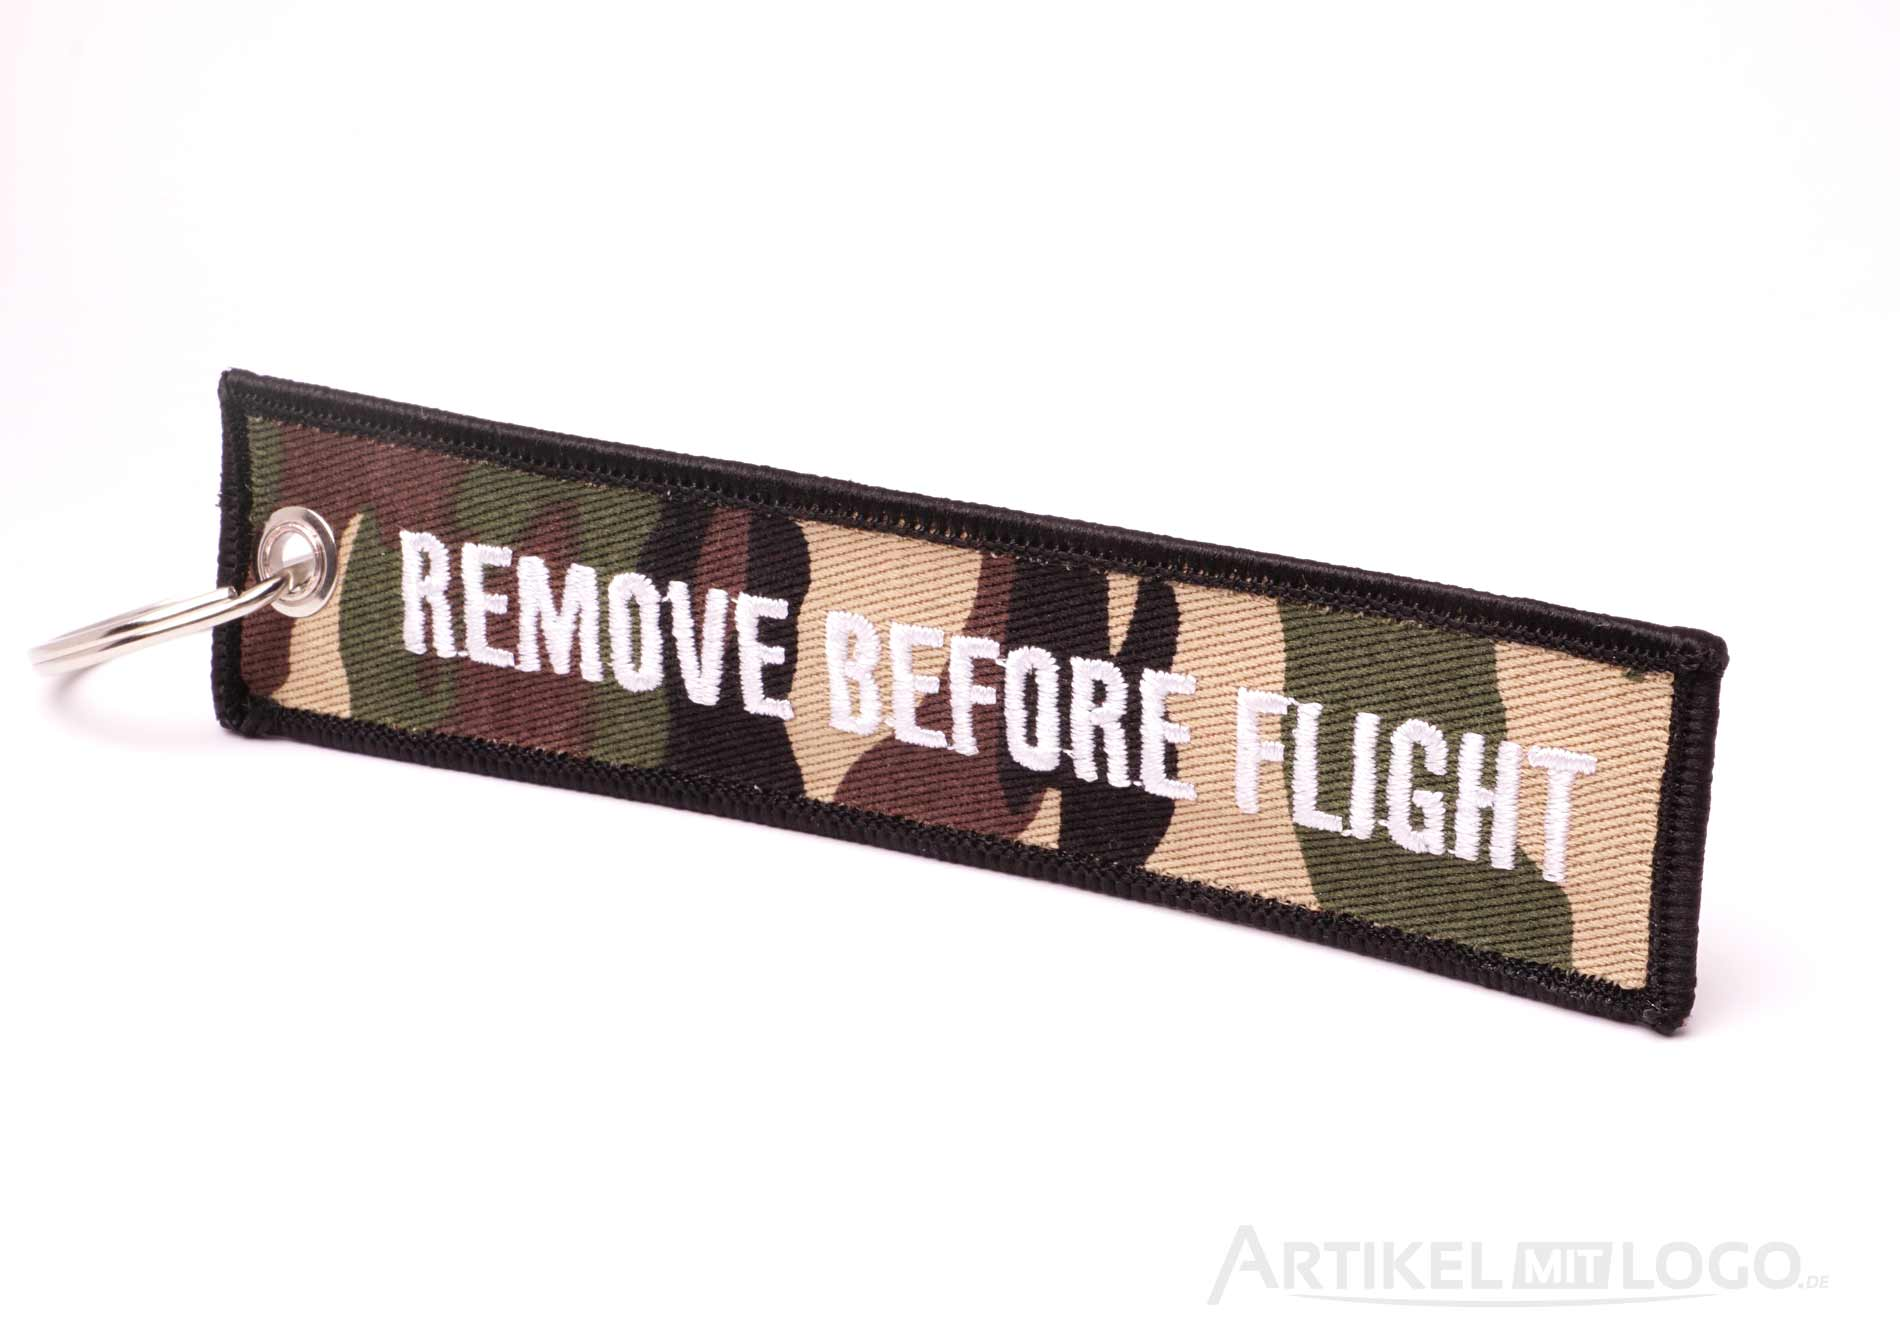 Remove Before Flight Schluesselanhaenger camouflage